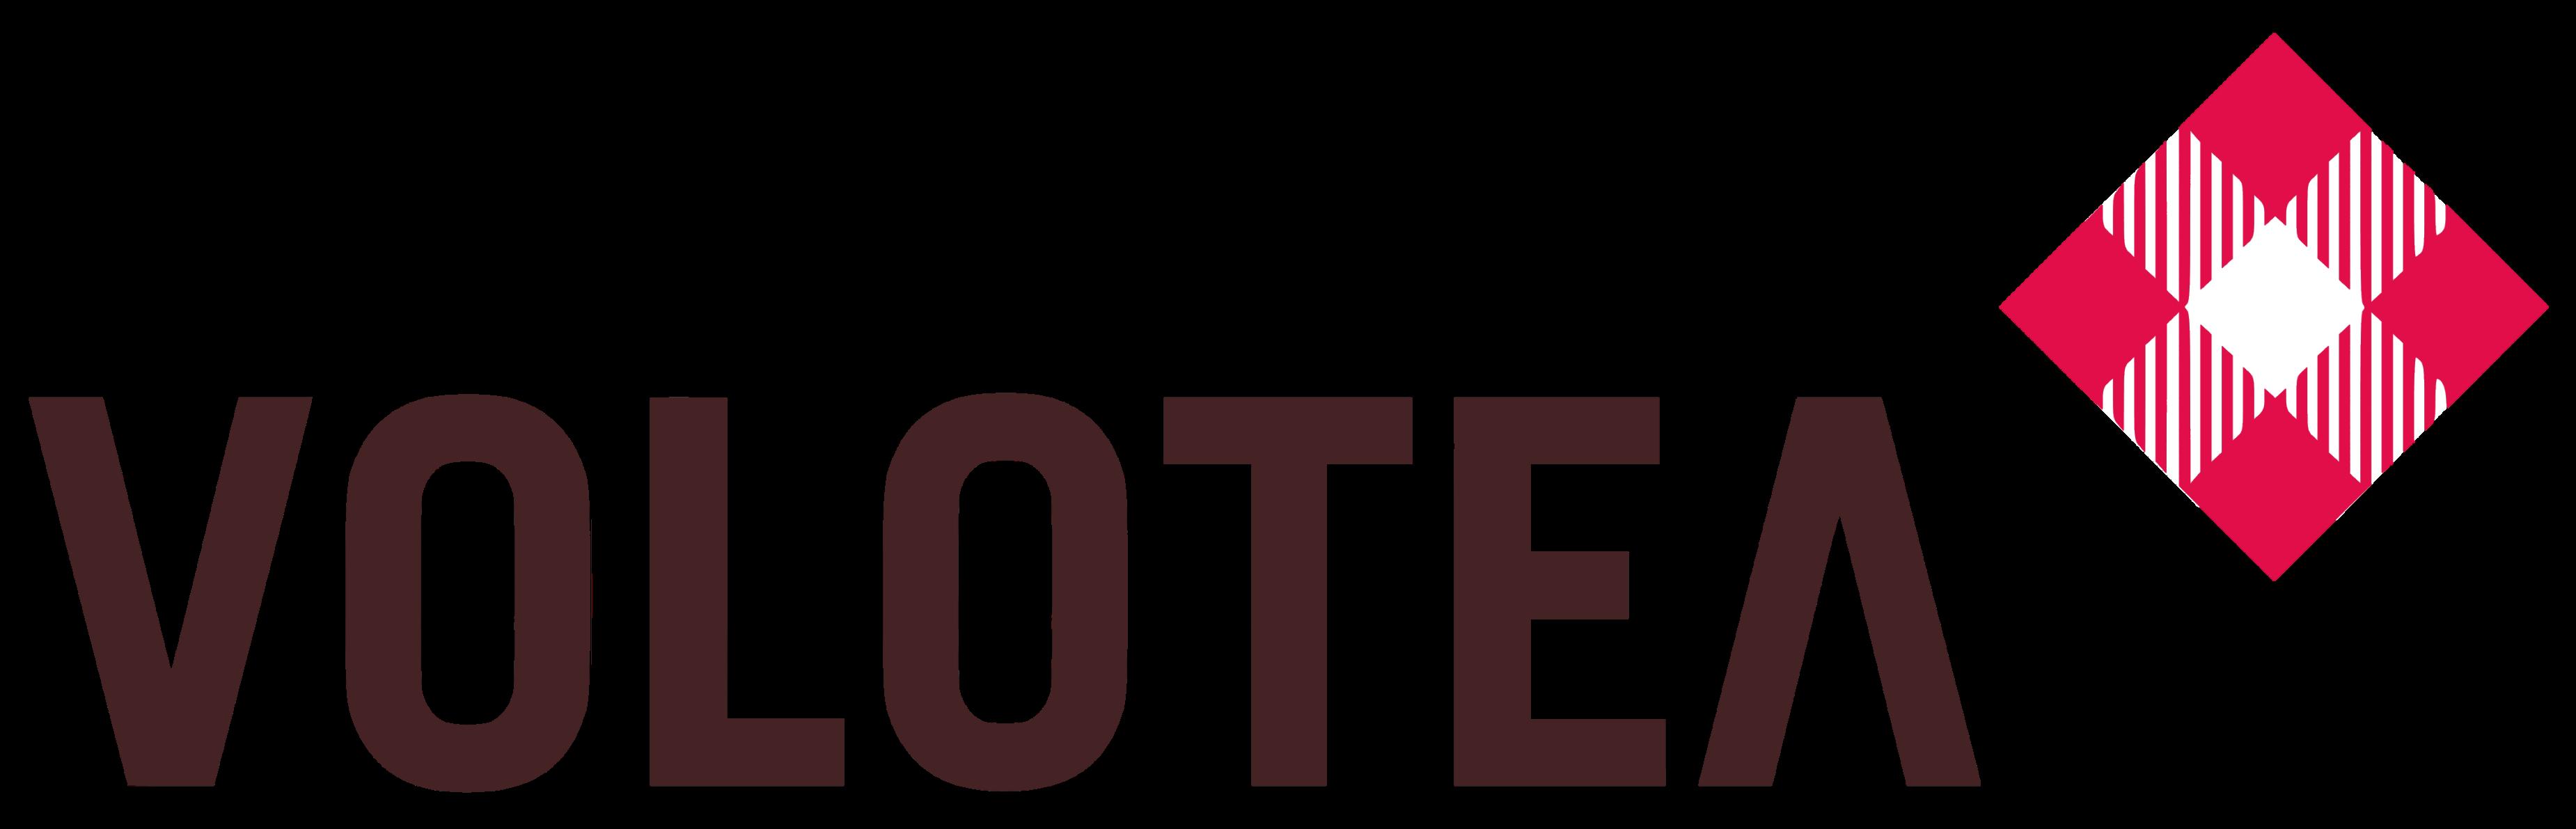 Volotea_logo_logotype